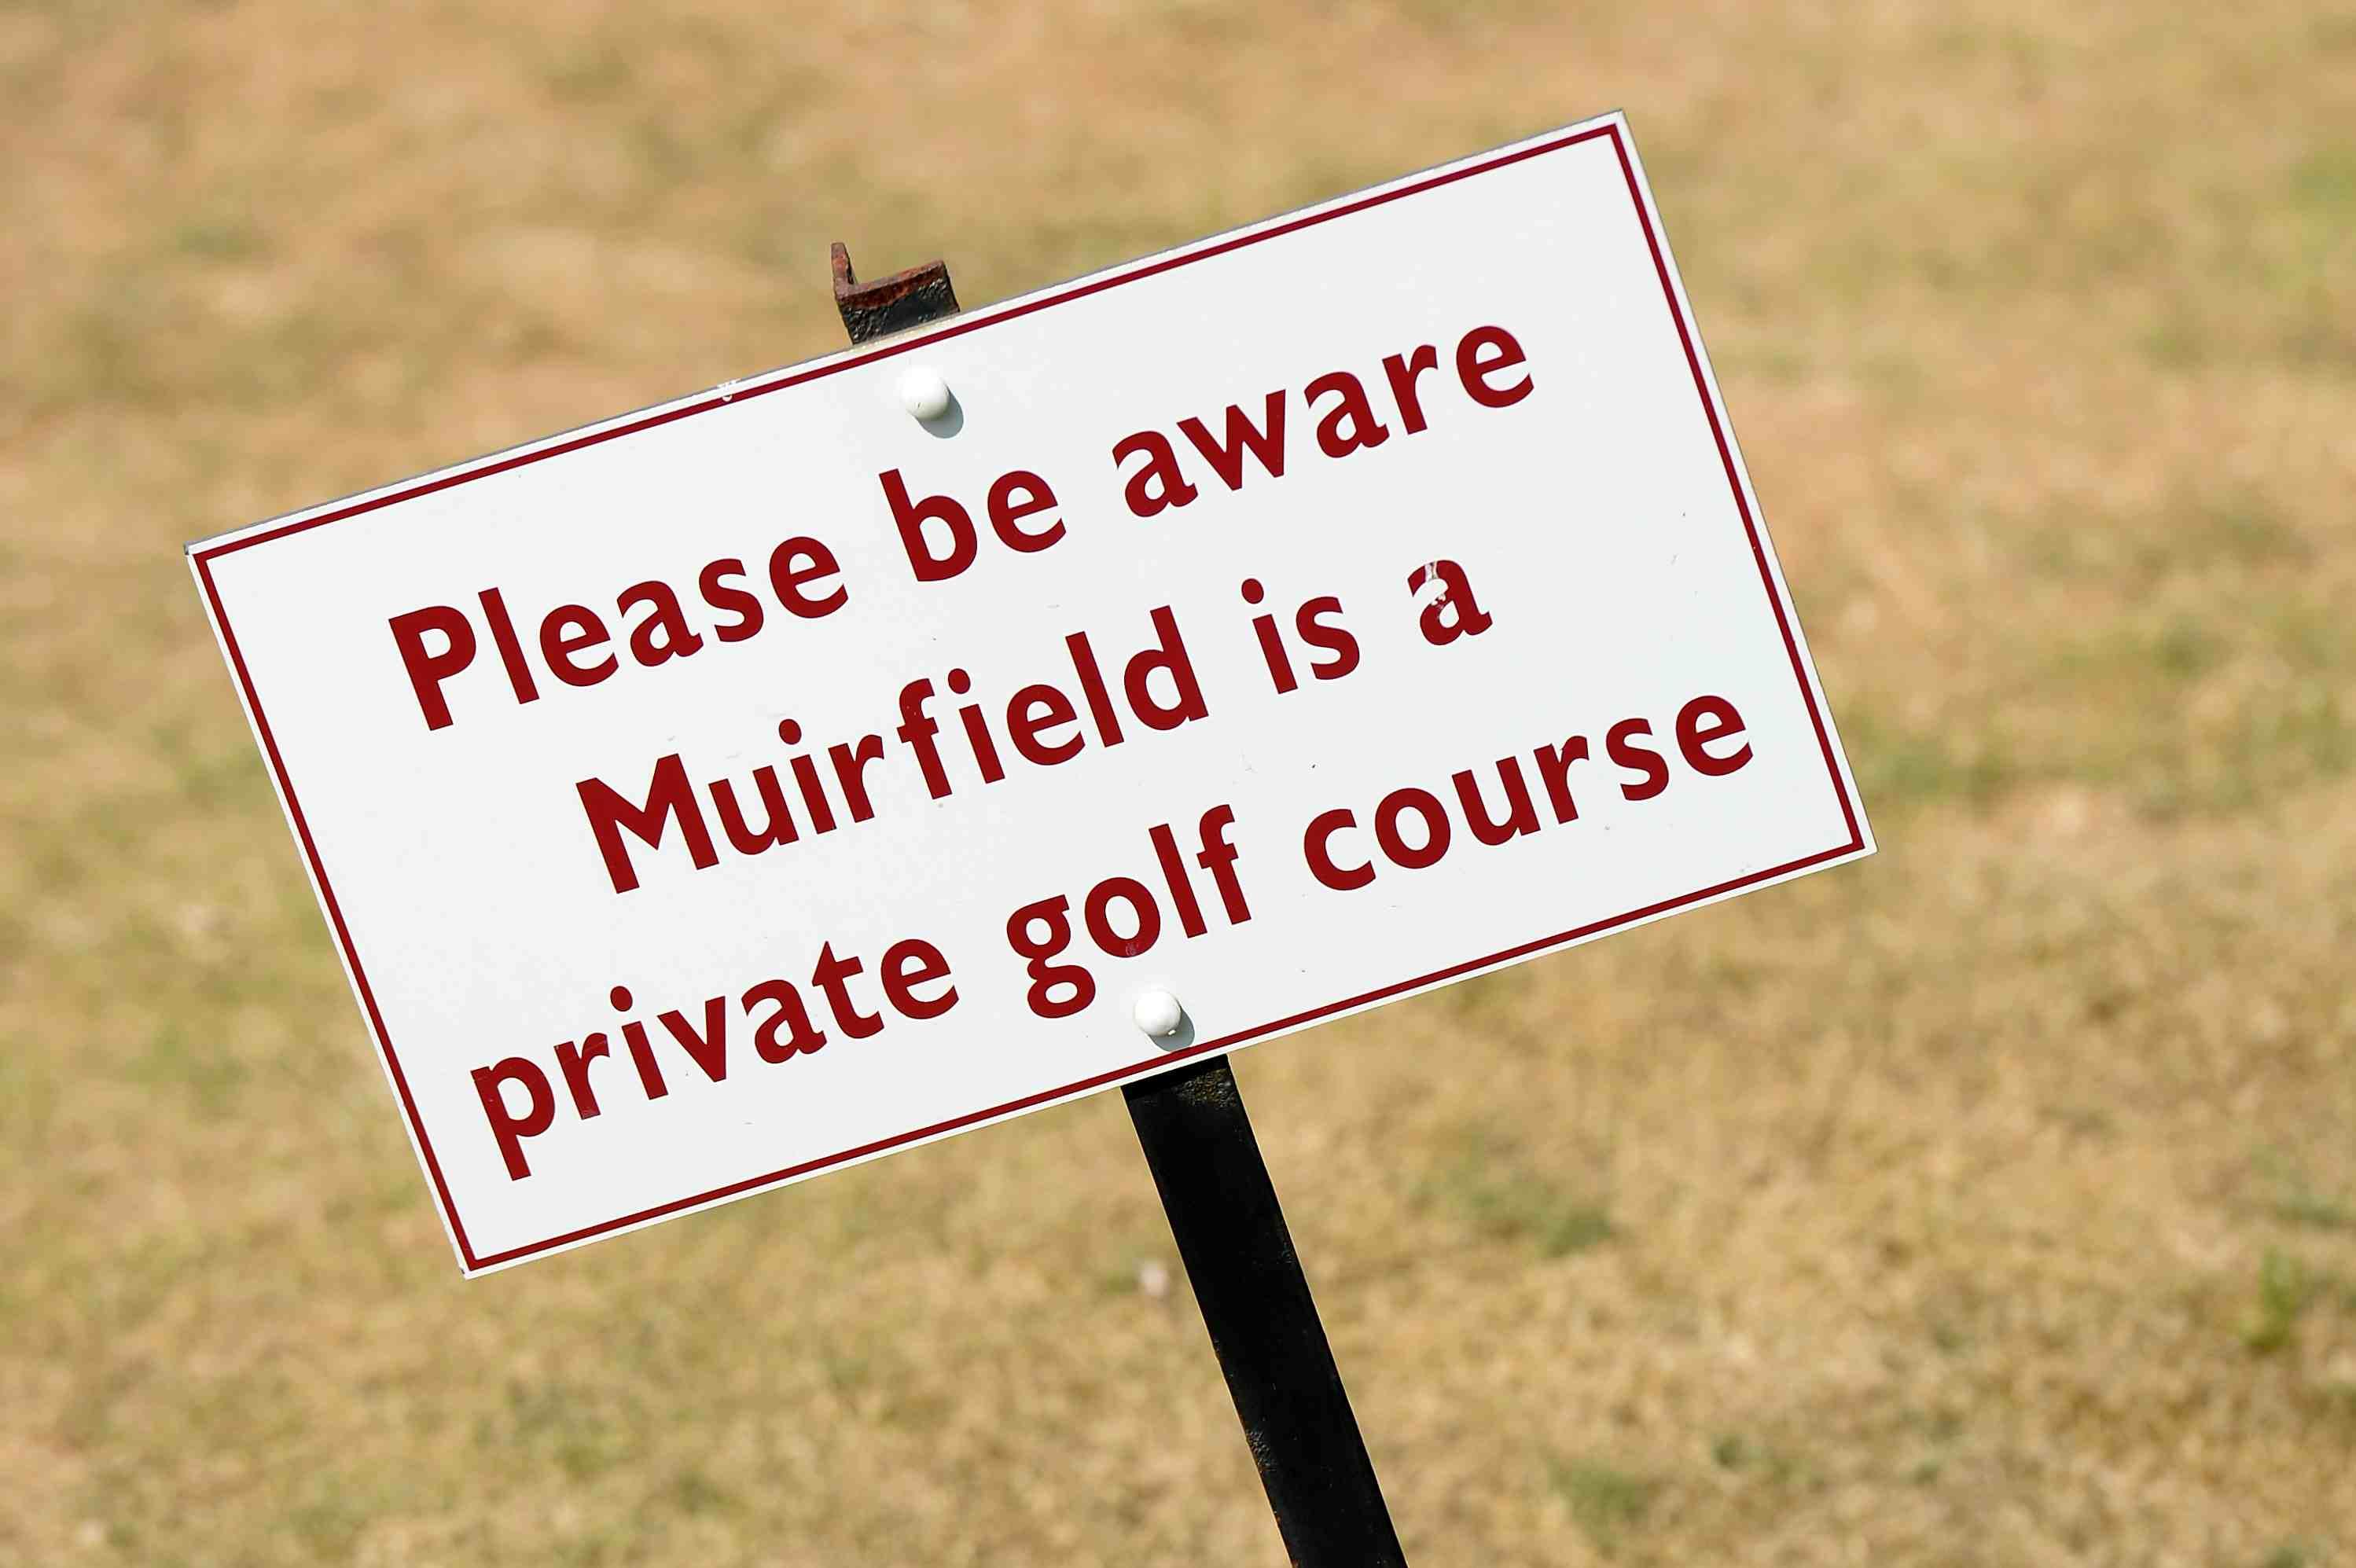 Muirfield golf course sign